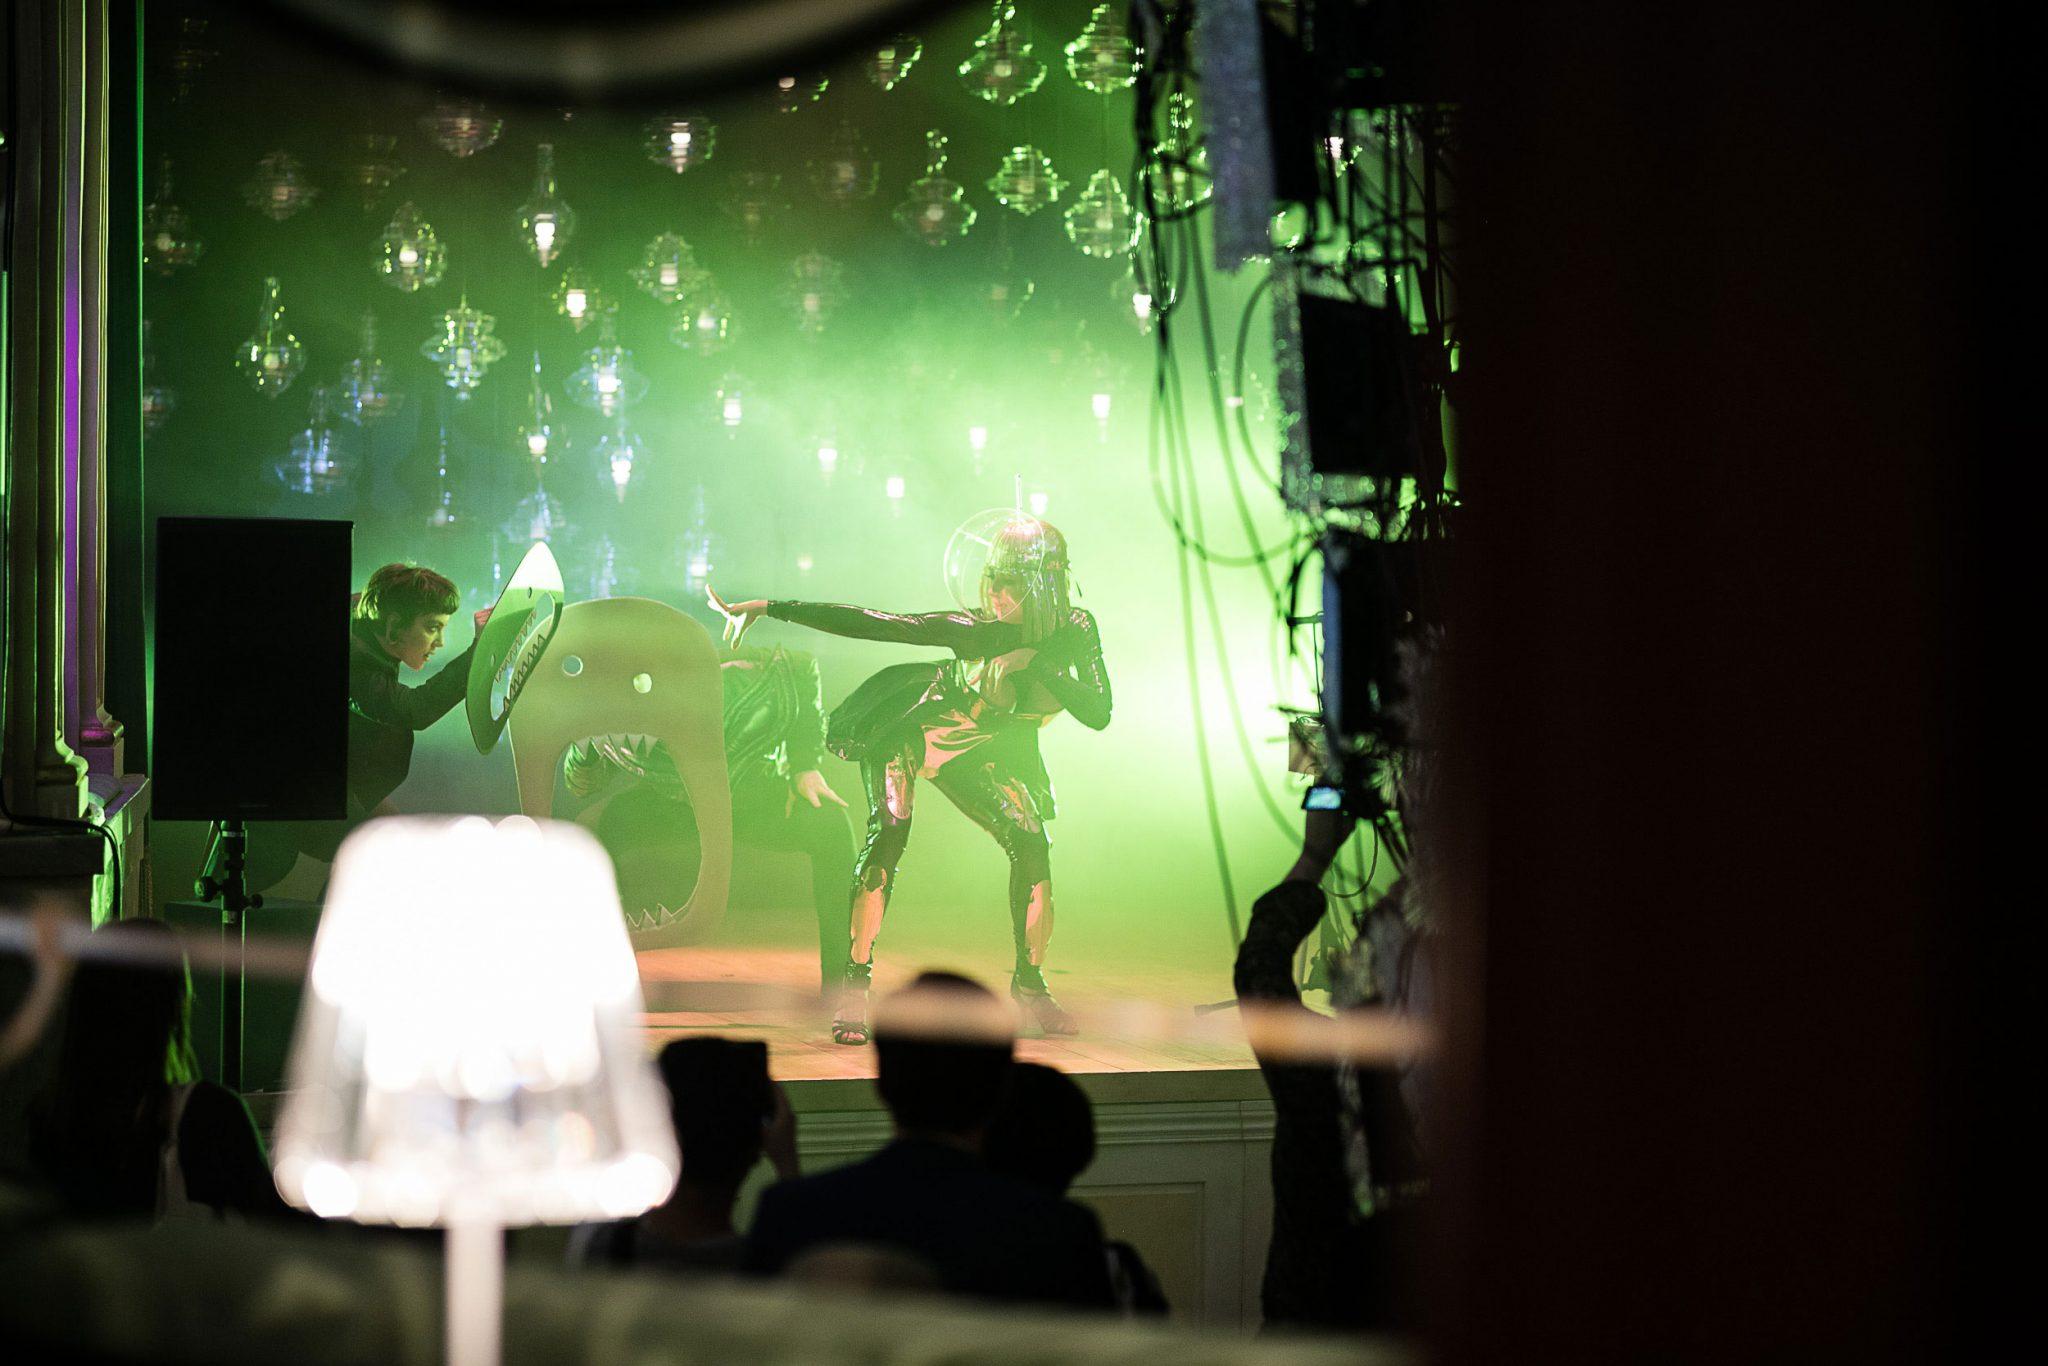 lasvit Monster Cabaret, A Phantasmagorical Show by Lasvit p9 lasvit monster cabaret milan teatro gerolamo yatzer